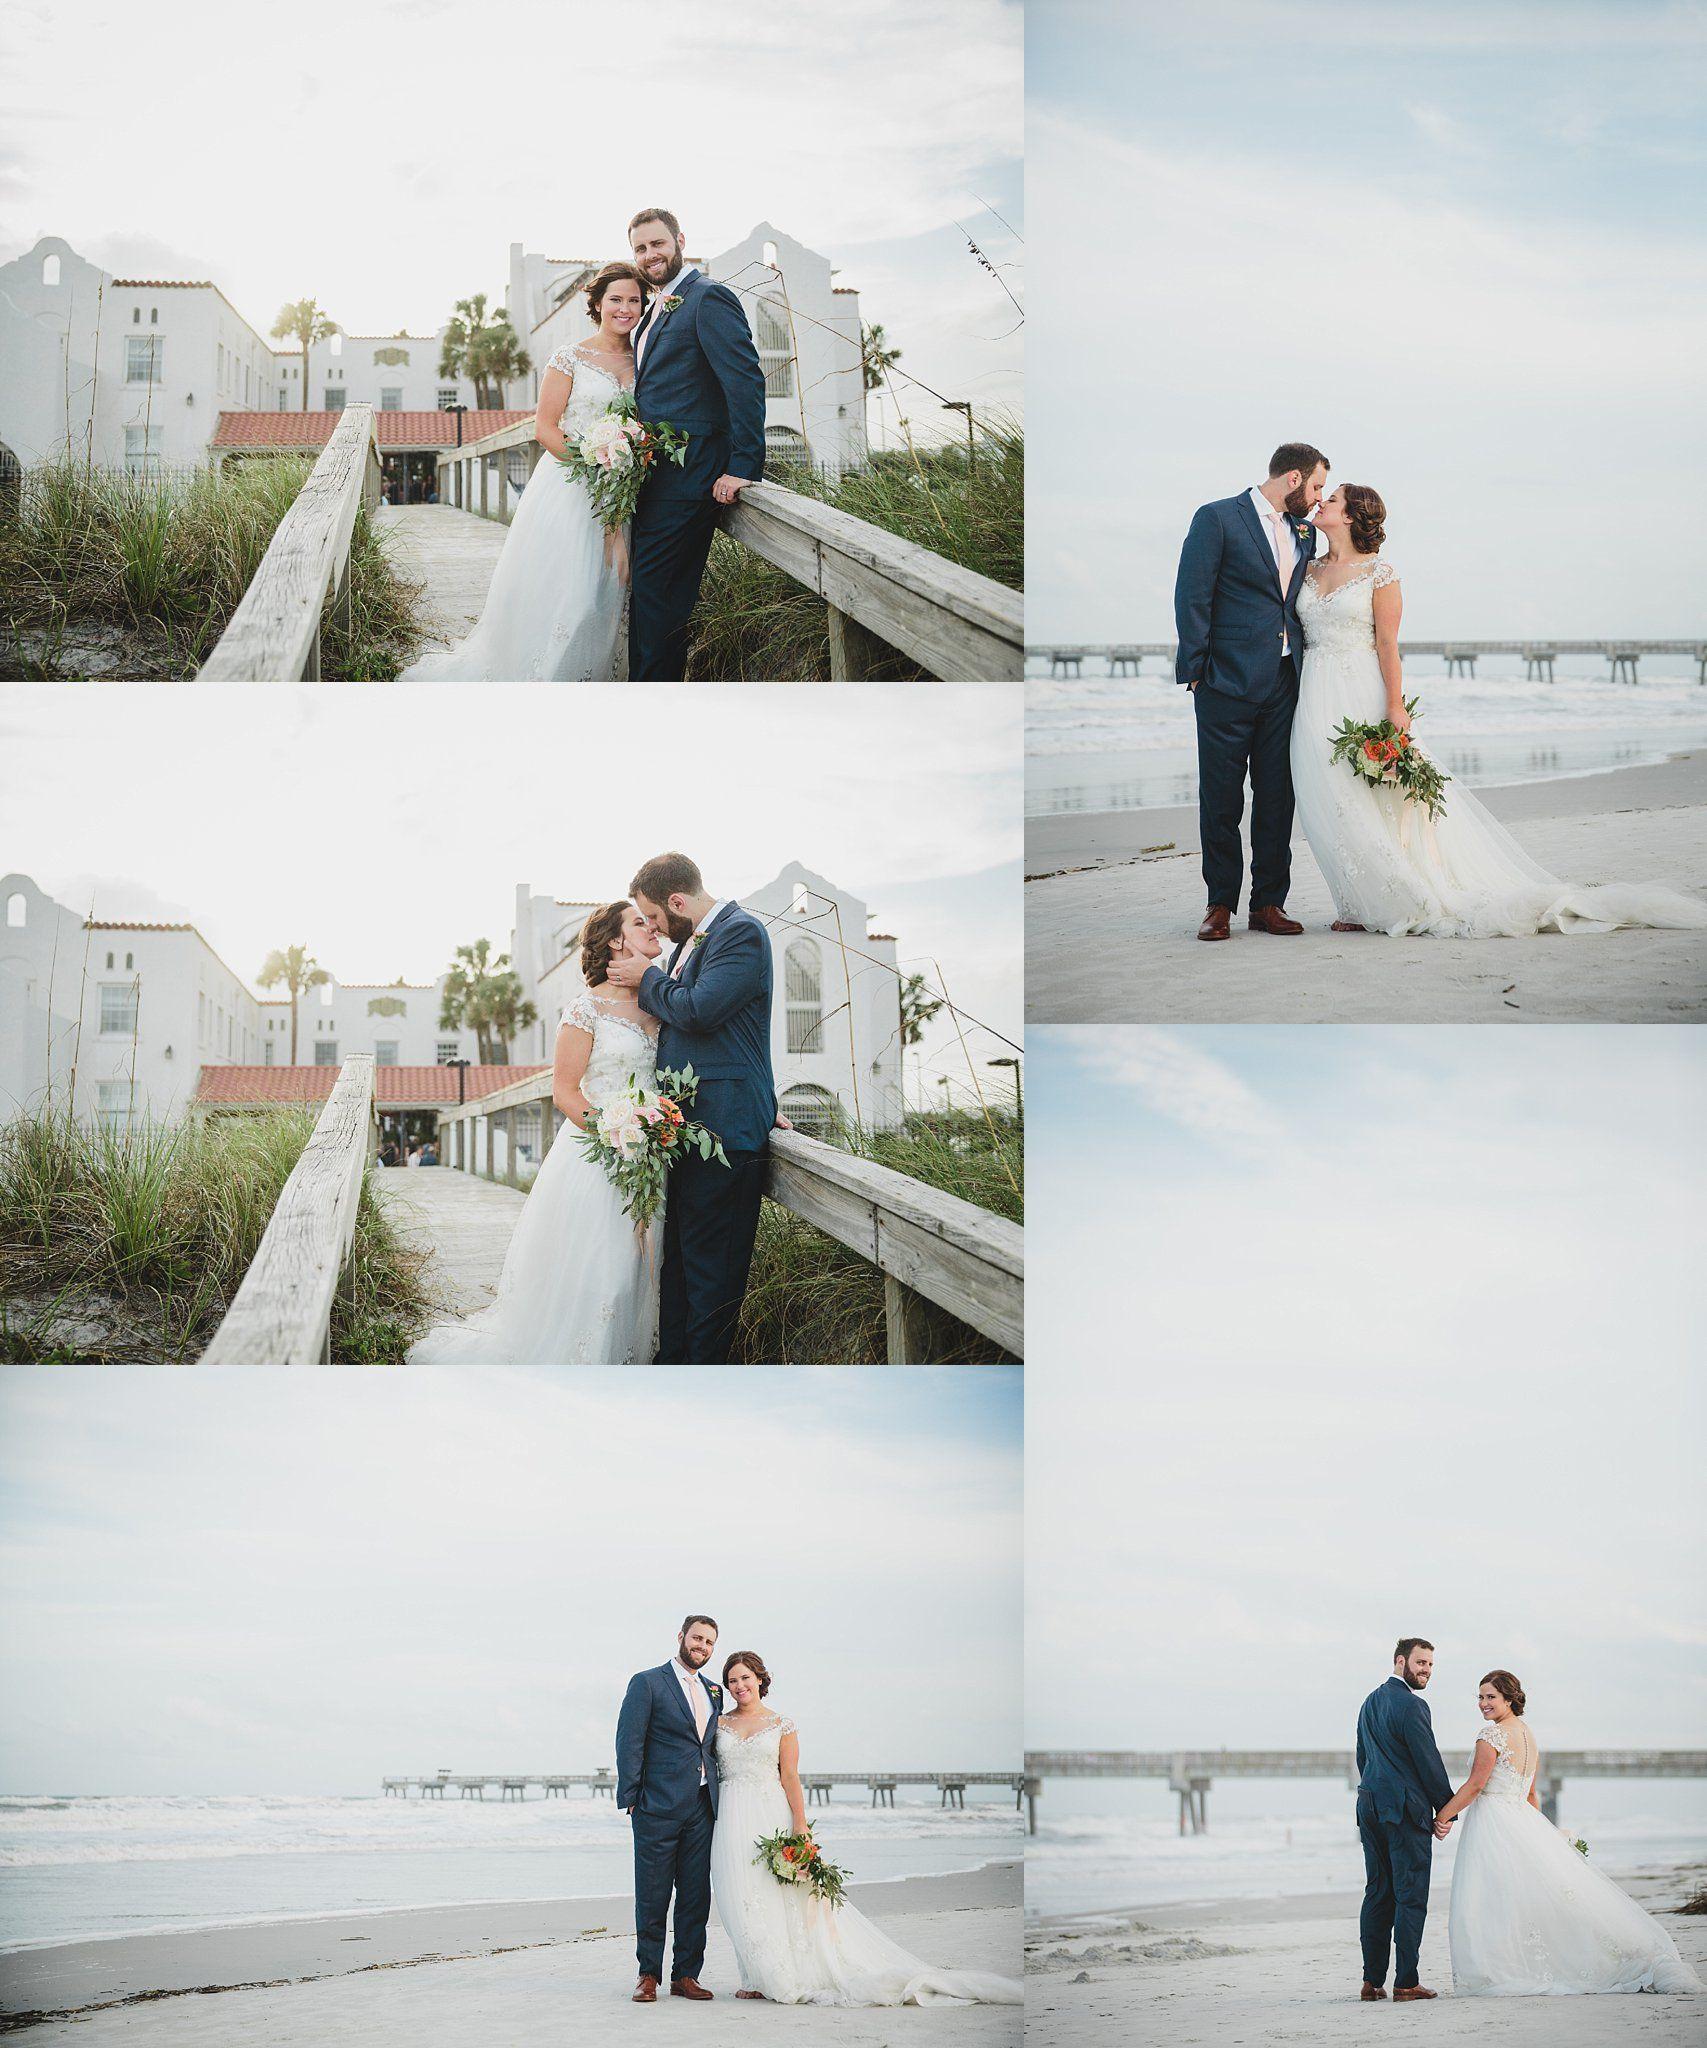 Jacksonville beach weddings  Casa Marina Wedding Jacksonville Beach FL by Stephanie W